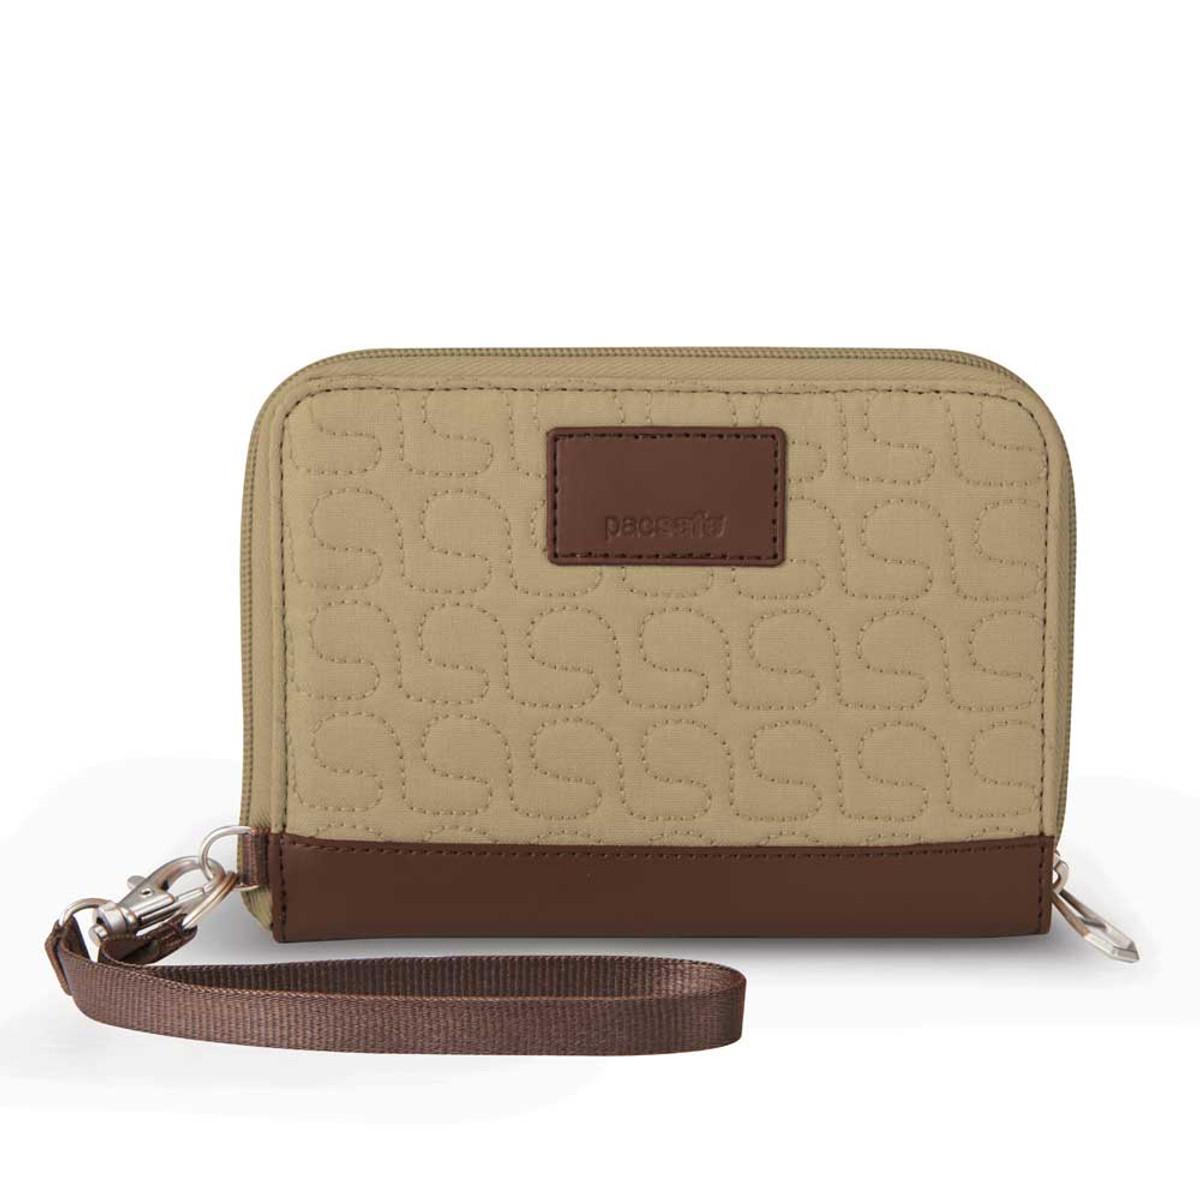 Pacsafe W150 RFID blocking wallet  Rosemary